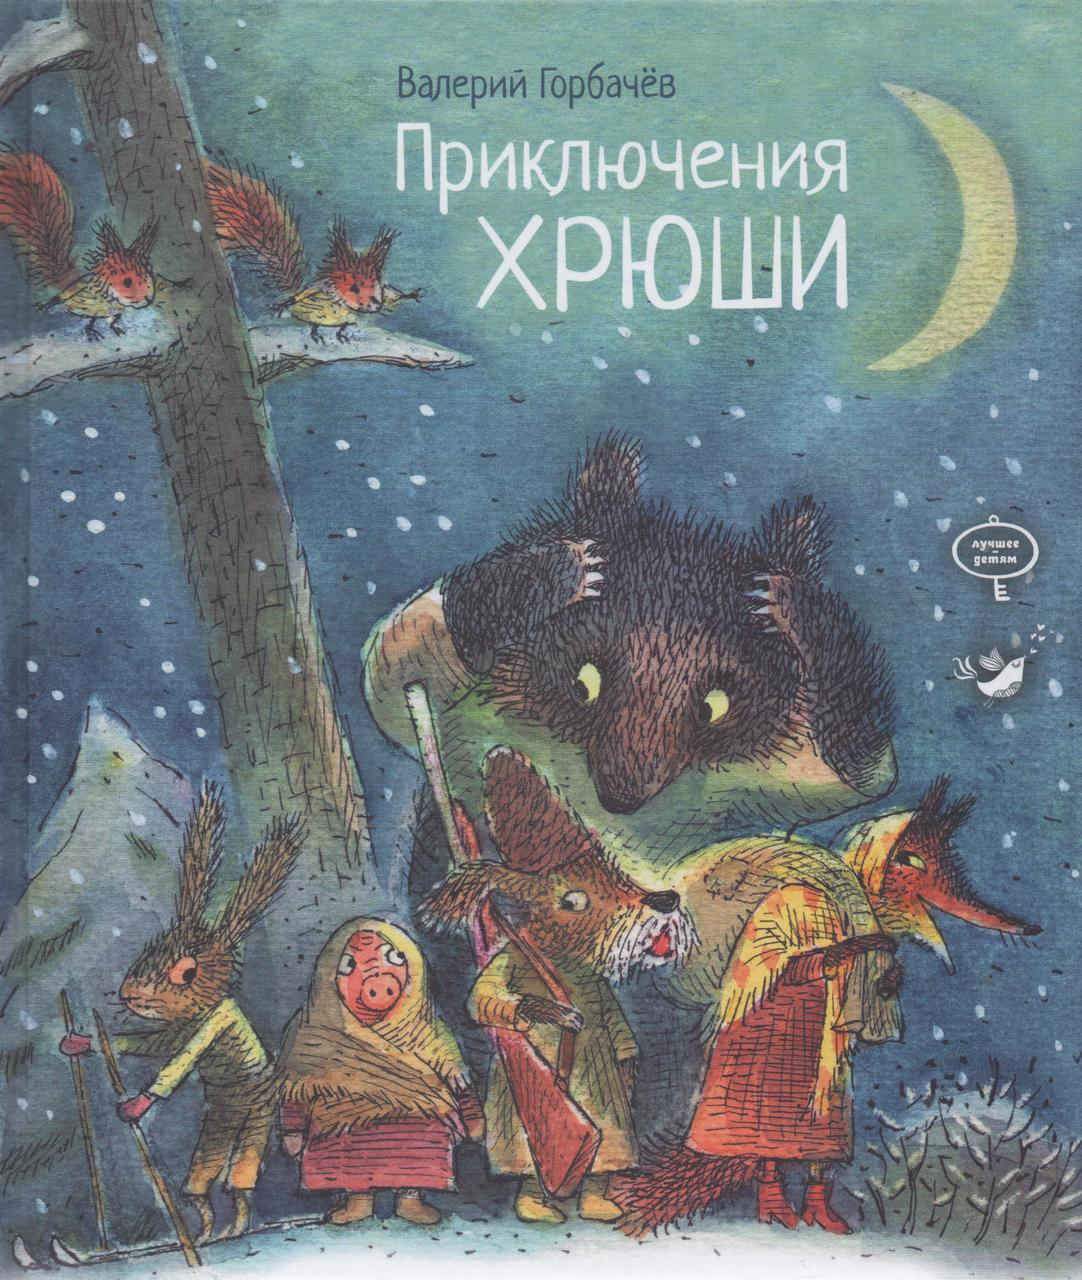 Приключения Хрюши. Валерий Горбачёв